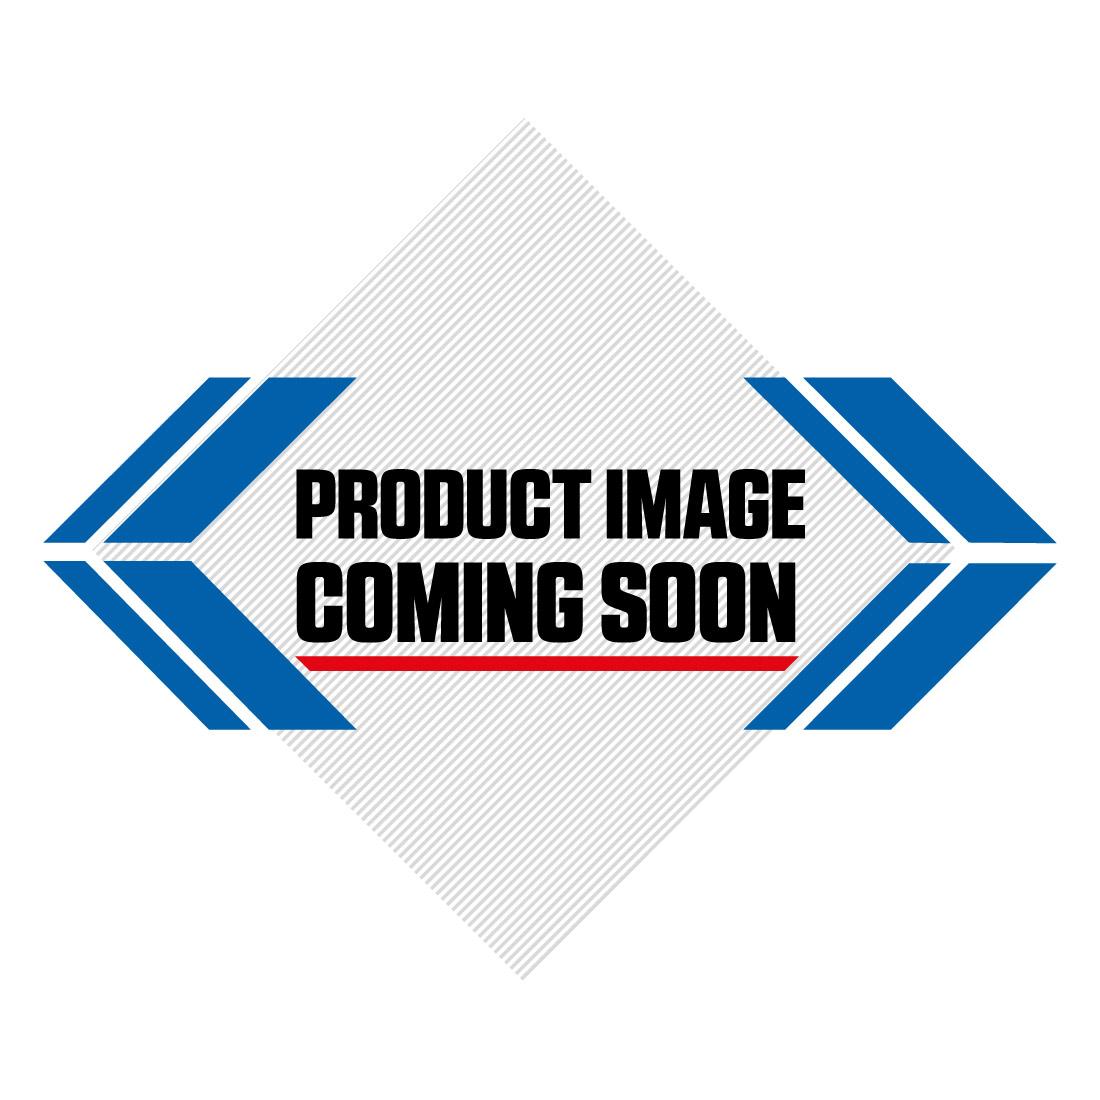 Kawasaki Restyled Plastic Kit KX 85 (2010) OEM Factory Image-5>